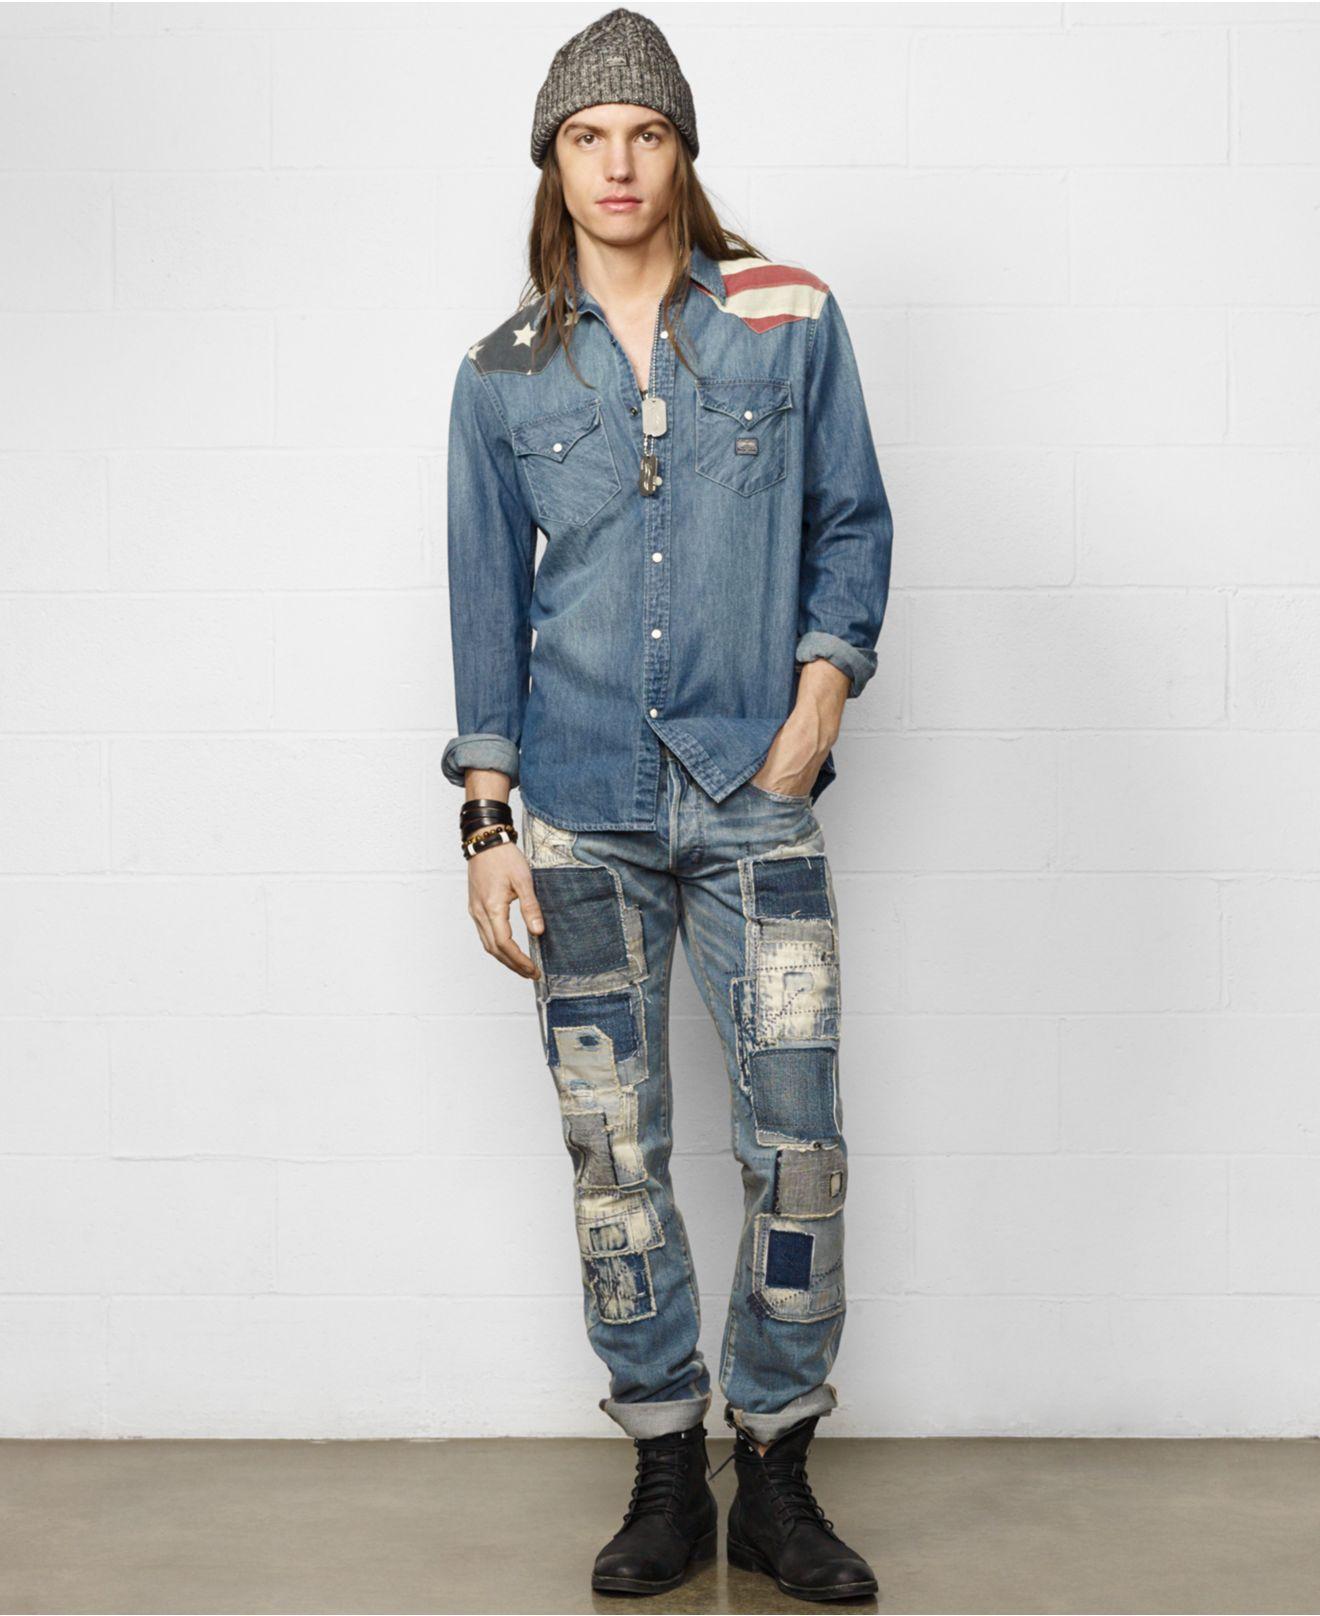 ea28b748b9 Lyst - Denim   Supply Ralph Lauren Flag-Yoke Cowboy Shirt in Blue ...